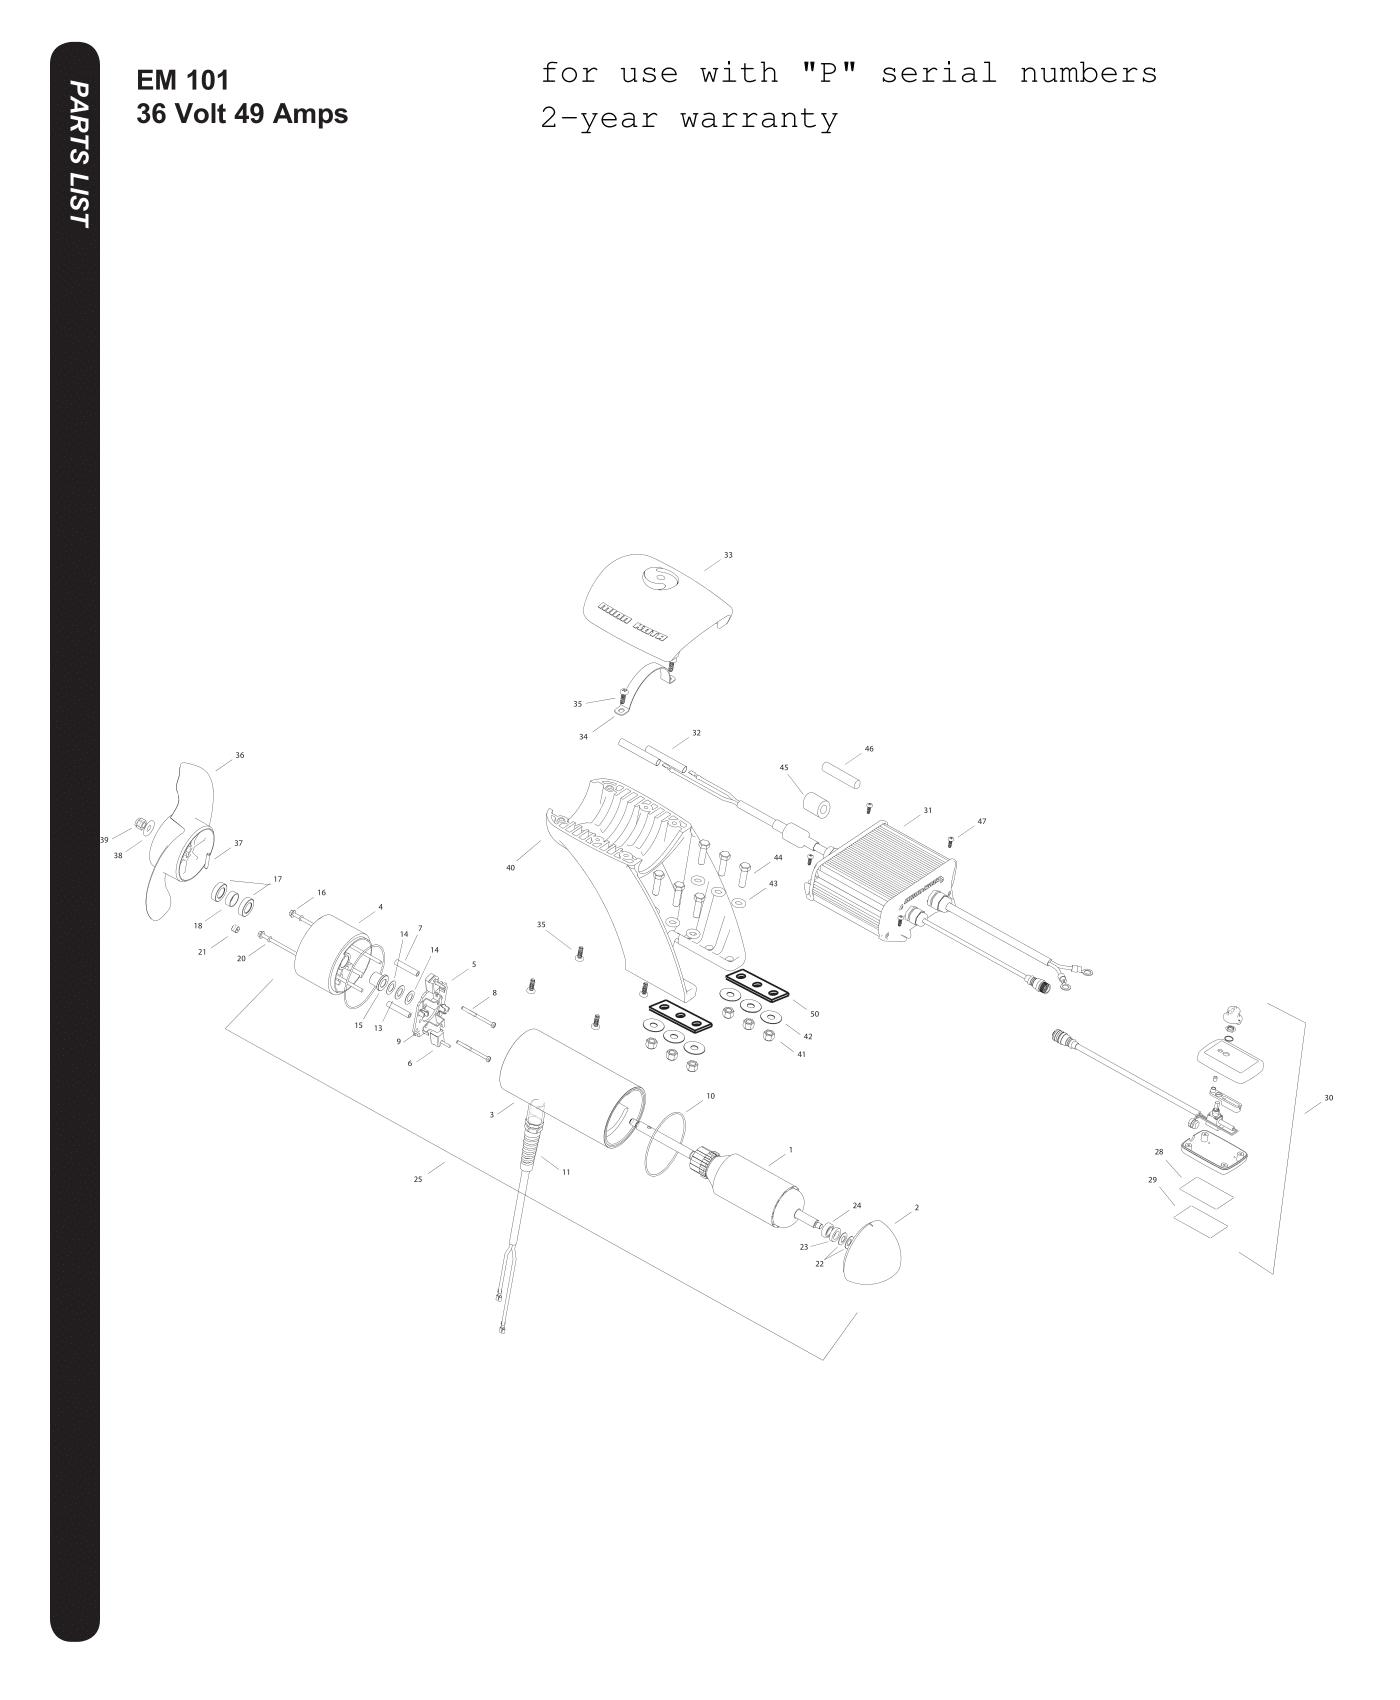 2015-mk-em101-1.png